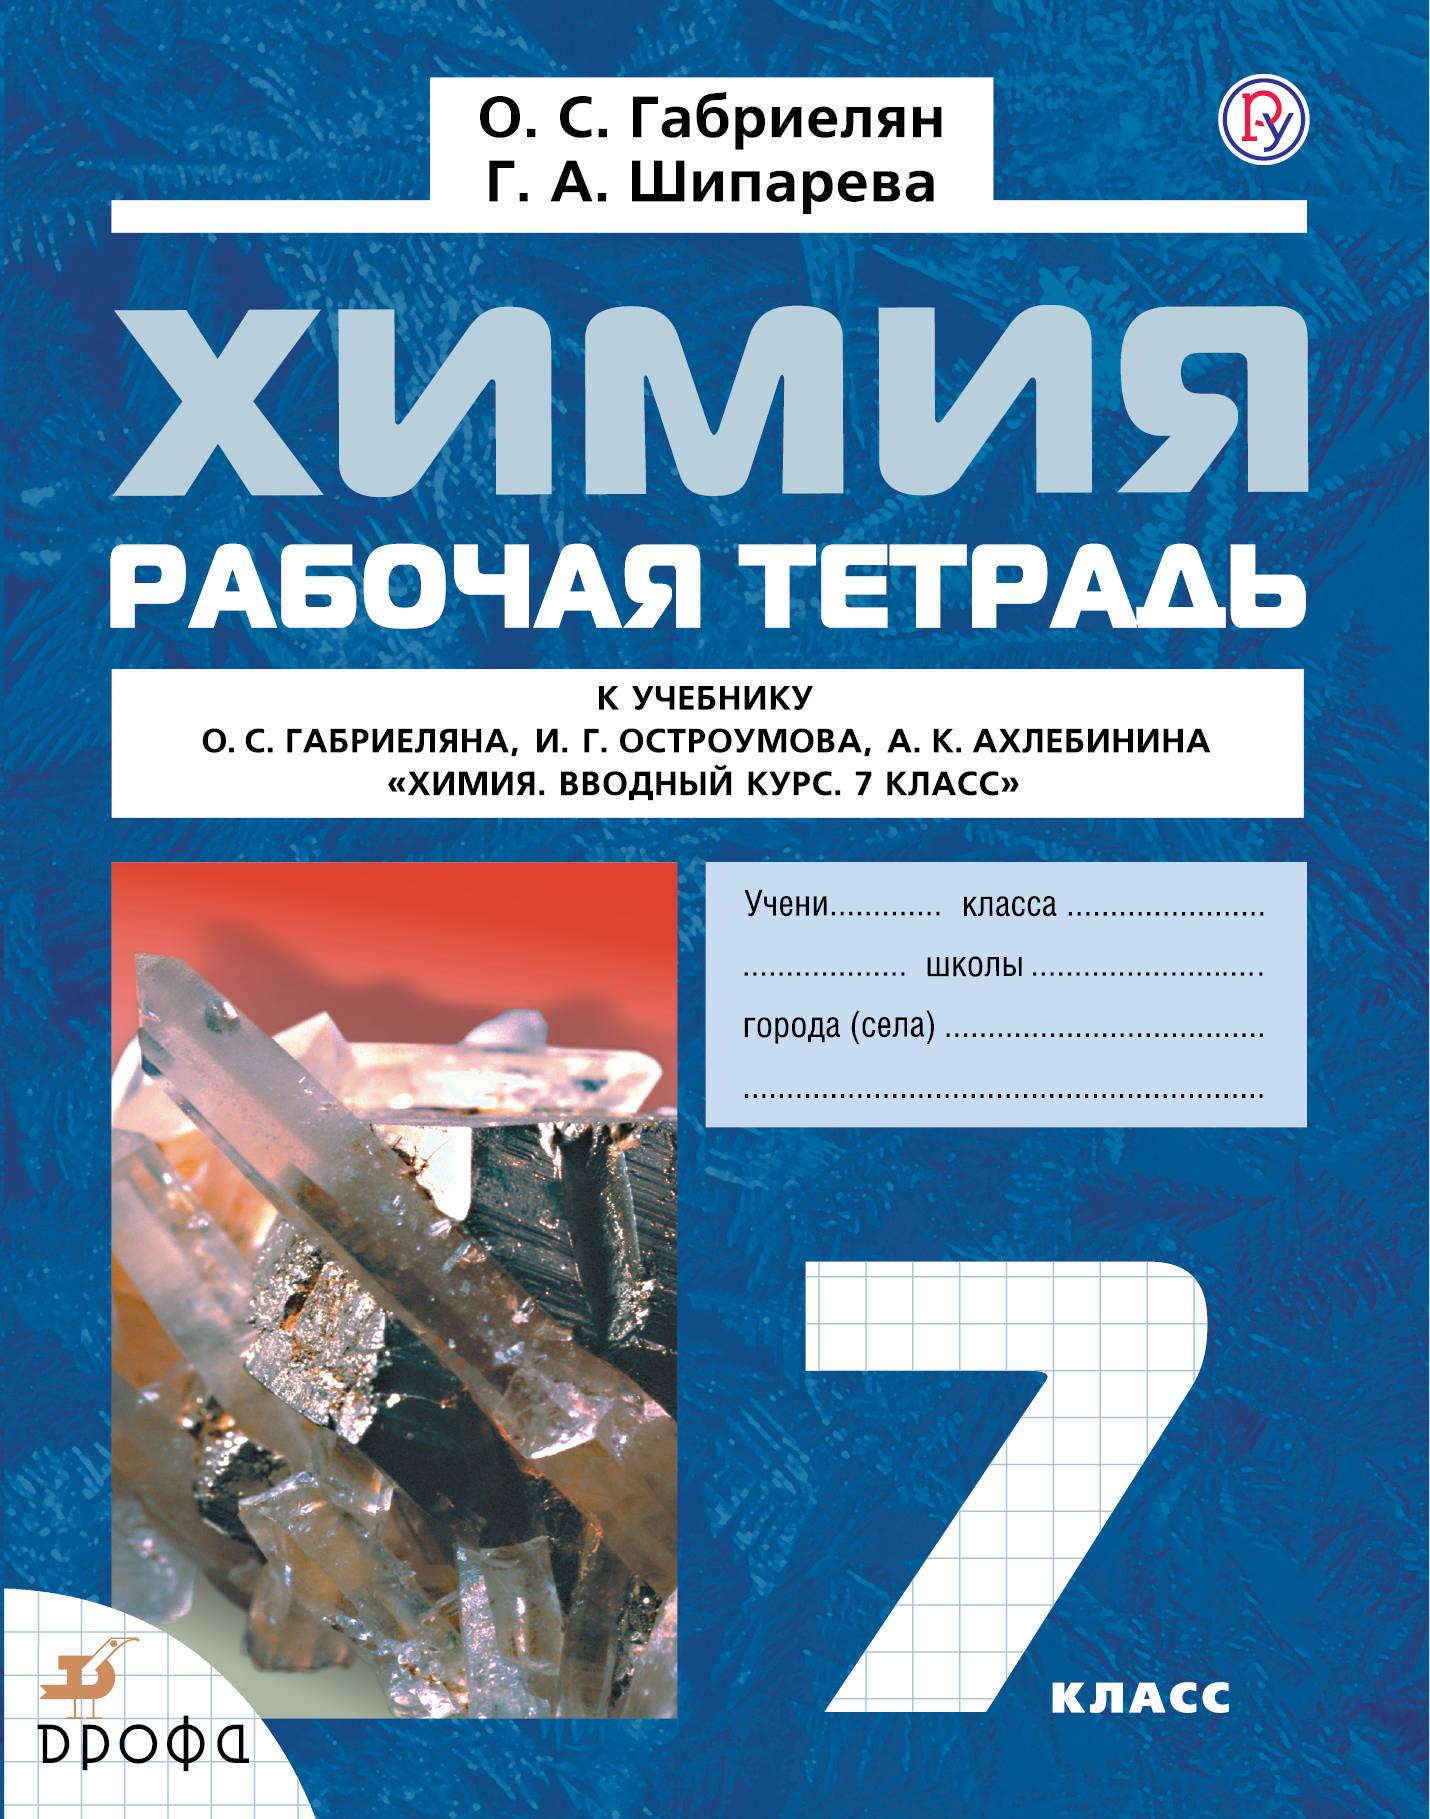 О. С. Габриелян,Г. А. Шипарёва Химия. 7 класс. Рабочая тетрадь